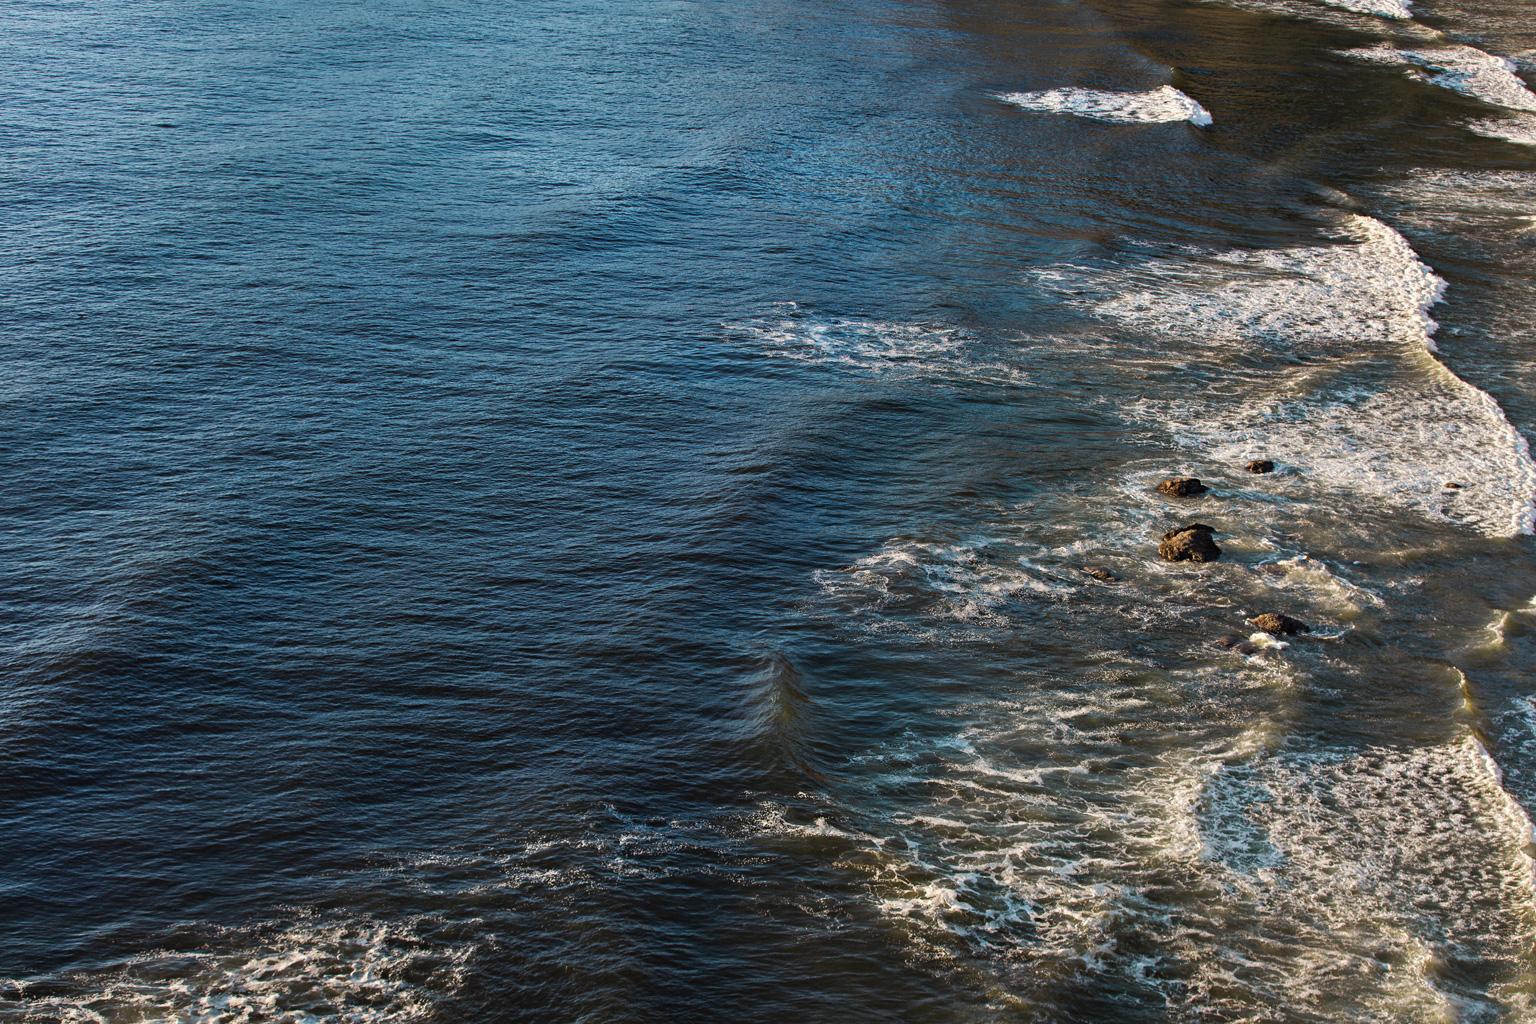 CindyGiovagnoli_Crater_Lake_National_Park_Cape_Perpetua_Heceta_Head_lighthouse_Pacific_Ocean_Cannon_Beach_haystack_Oregon_coast-021.jpg